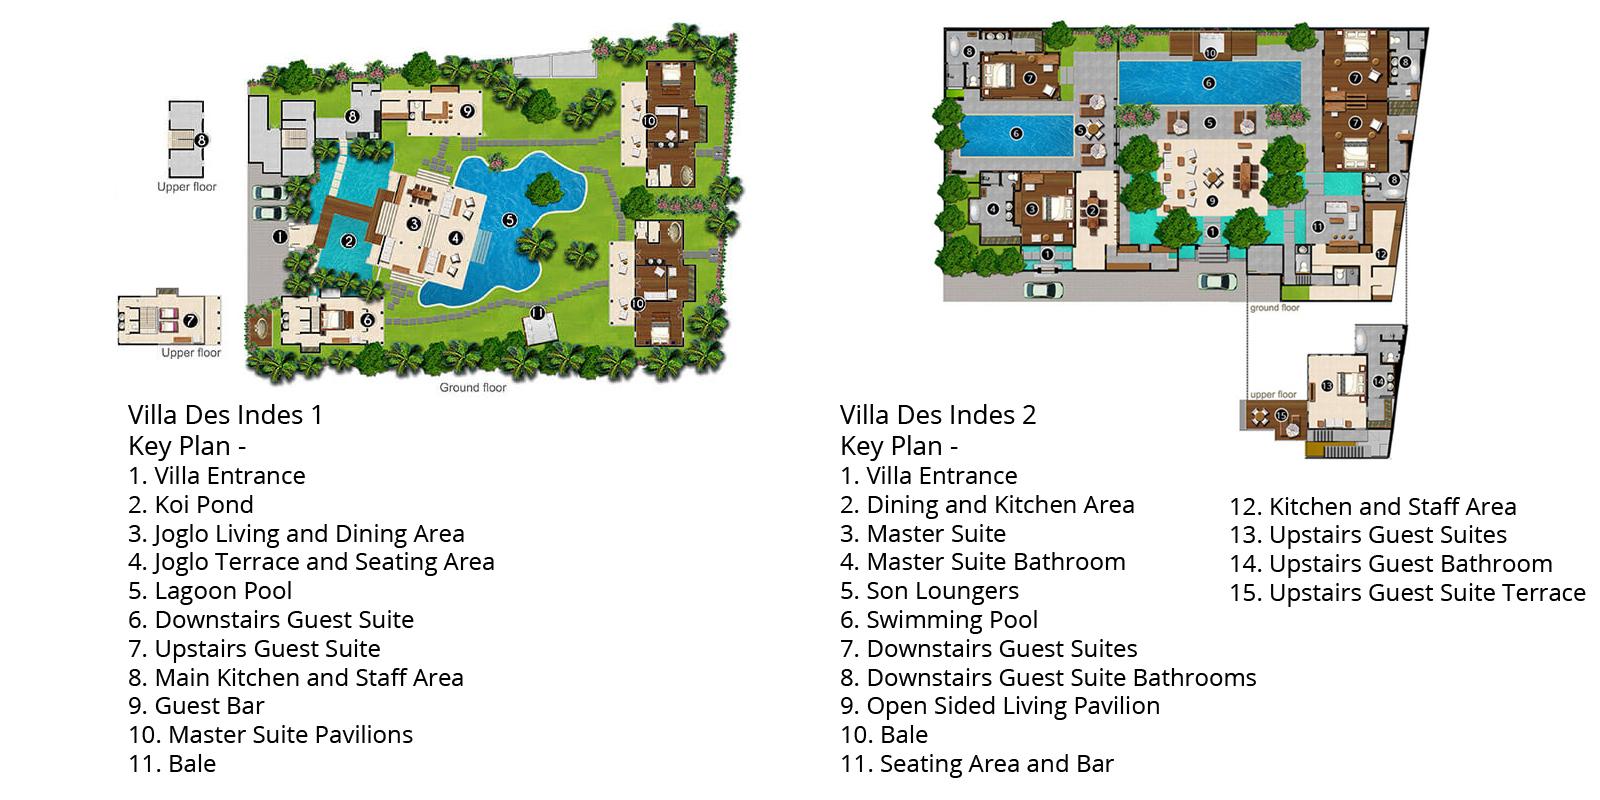 Des Indes Villas Floorplan | Seminyak, Bali